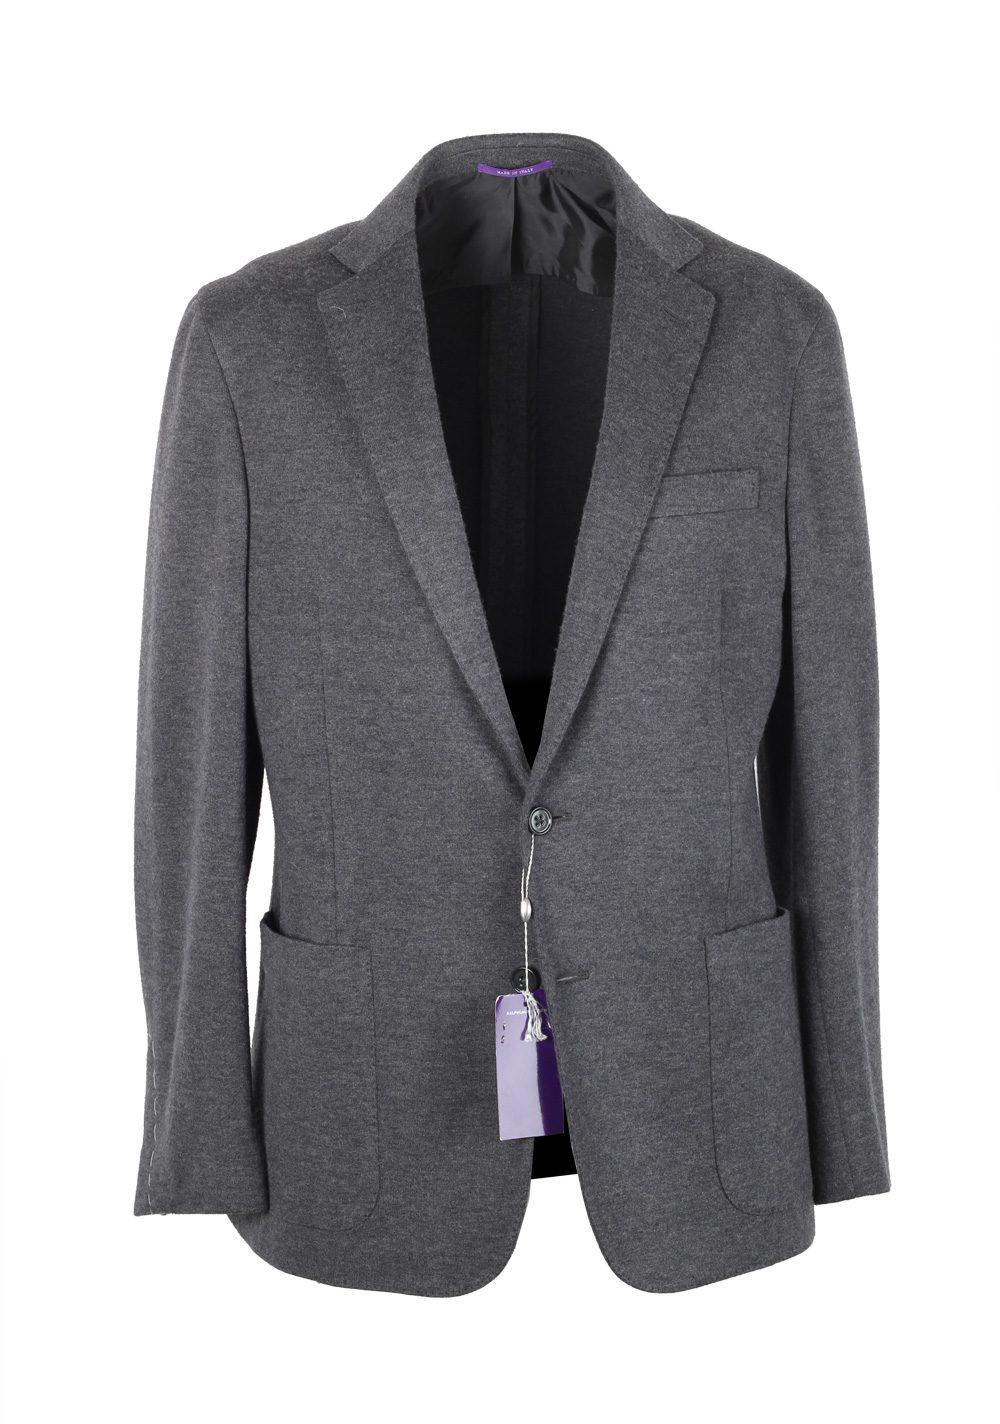 Ralph Lauren Purple Label Gray Sport Coat Size 50 / 40R U.S. In Wool Blend | Costume Limité